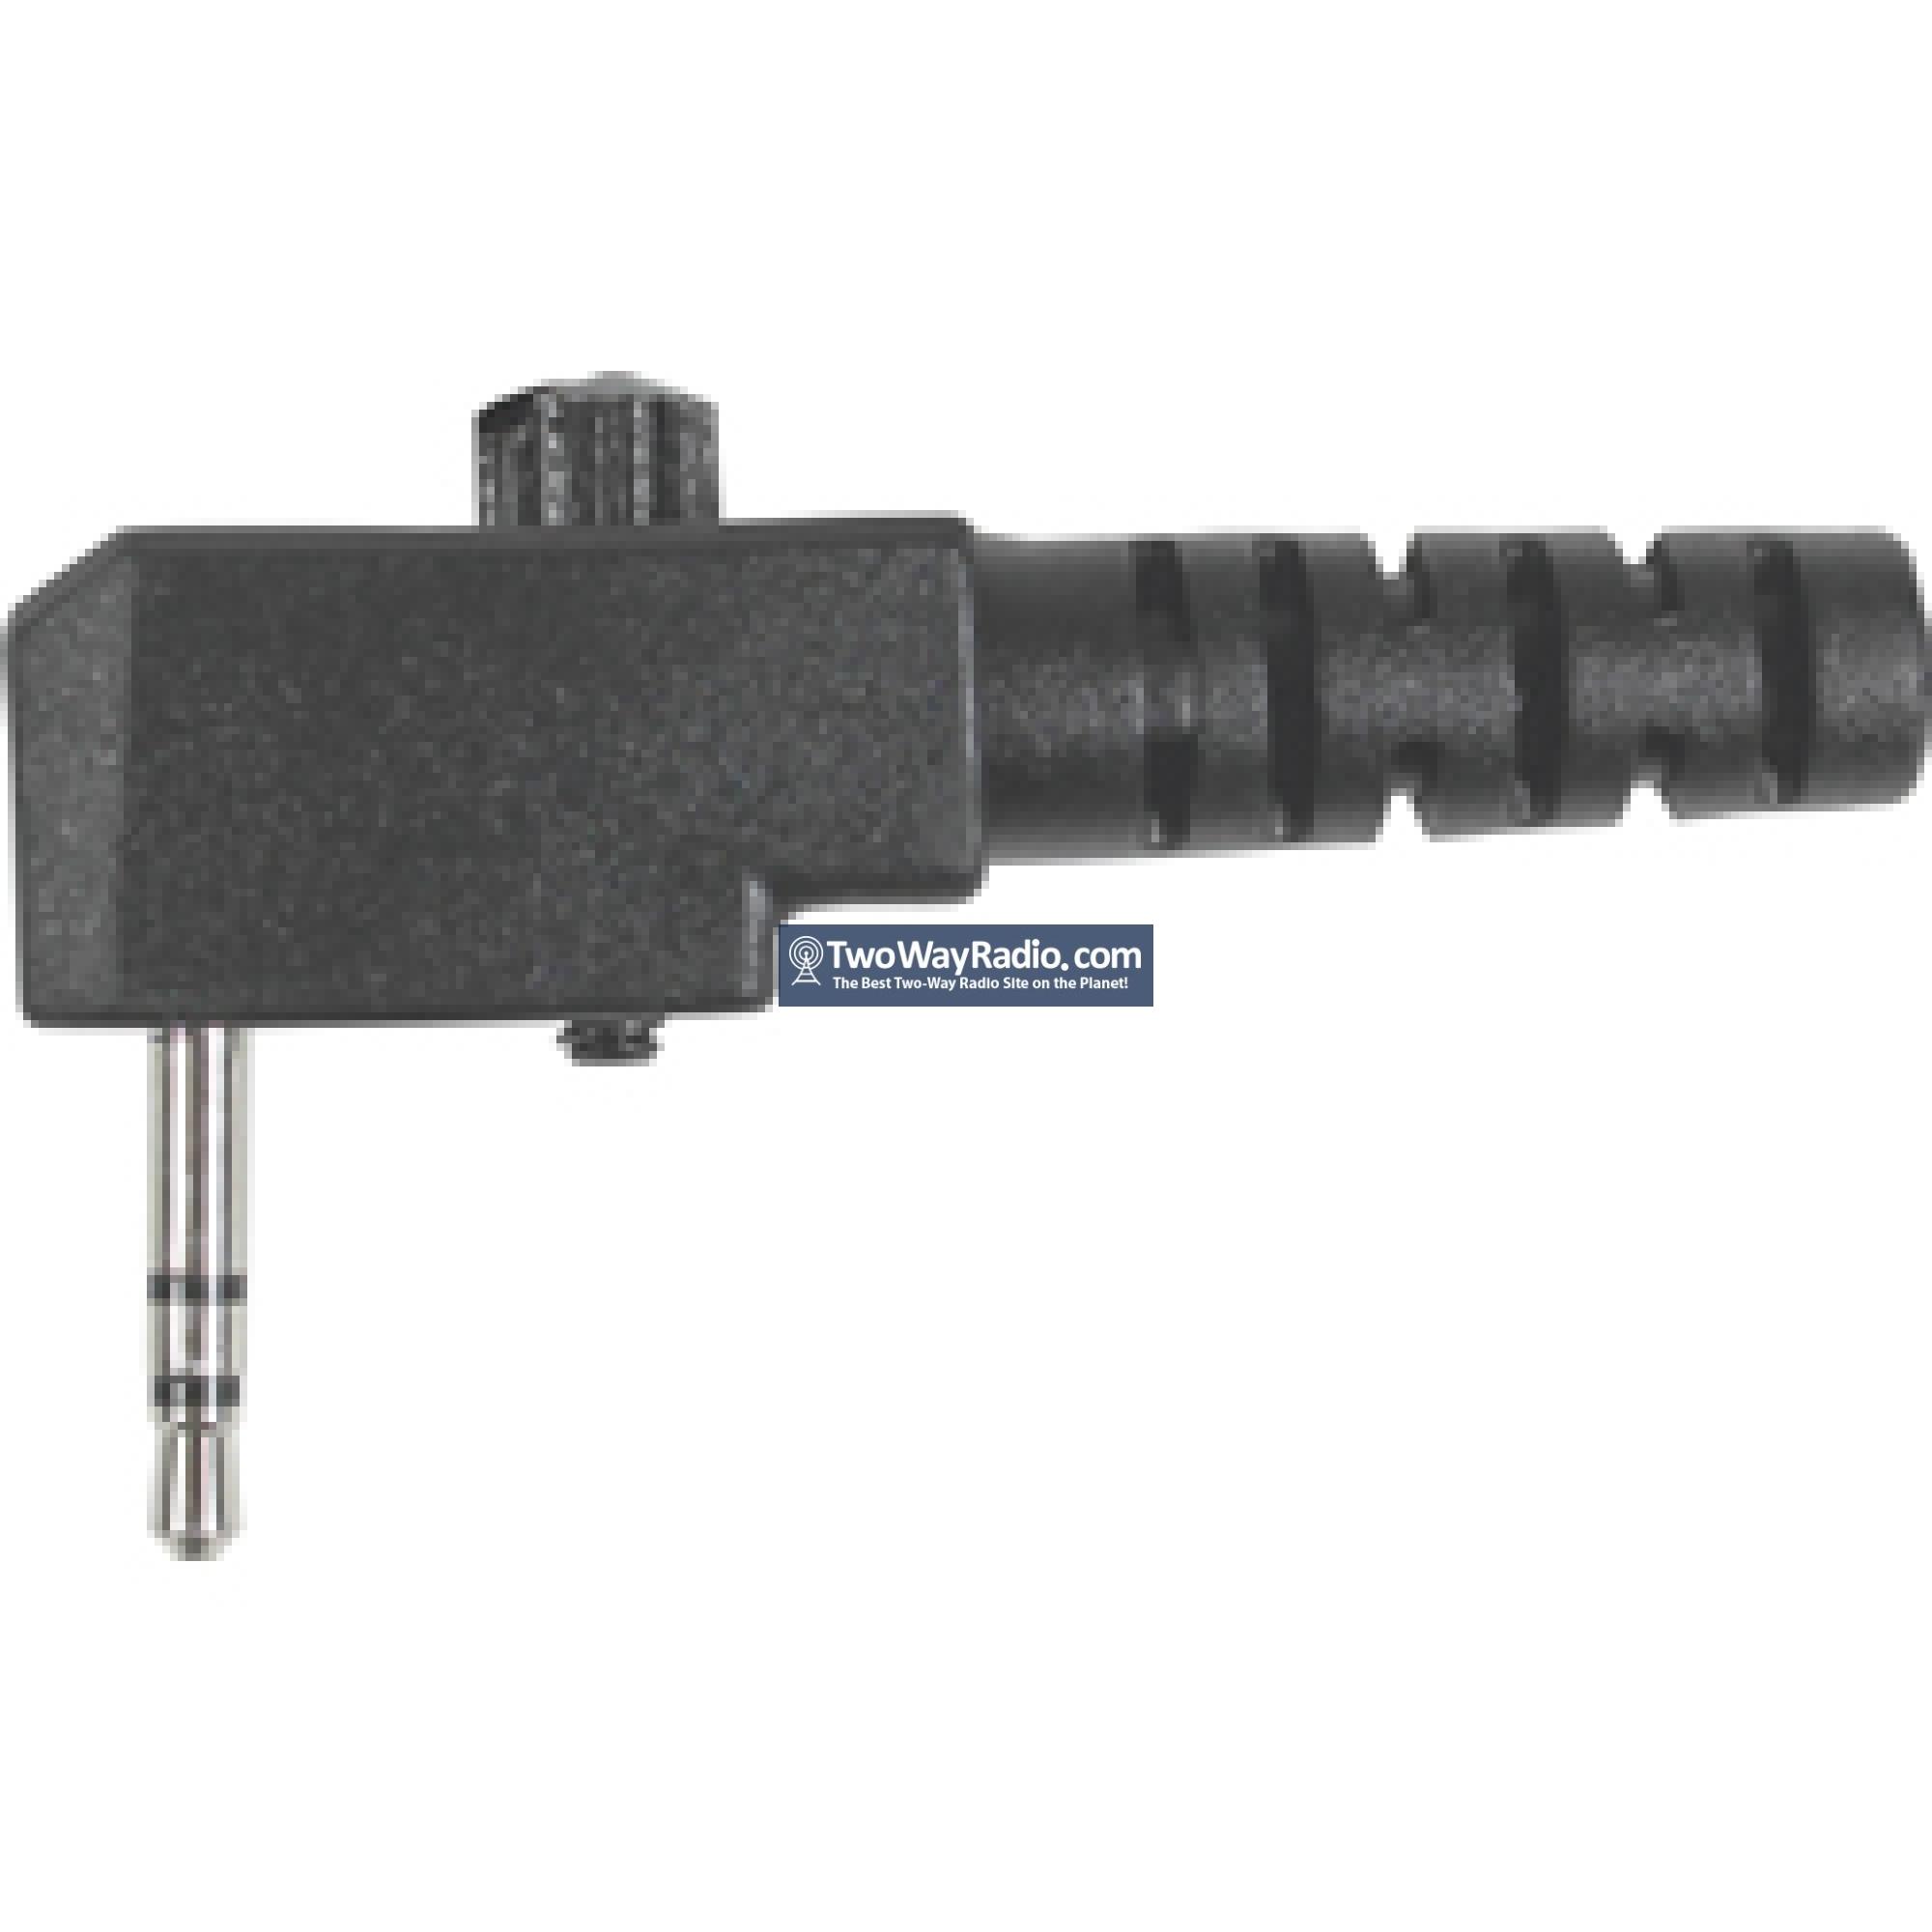 Buy Here | Hytera TC-320 U1 Two-Way Radio - 2W, 16C, UHF(450